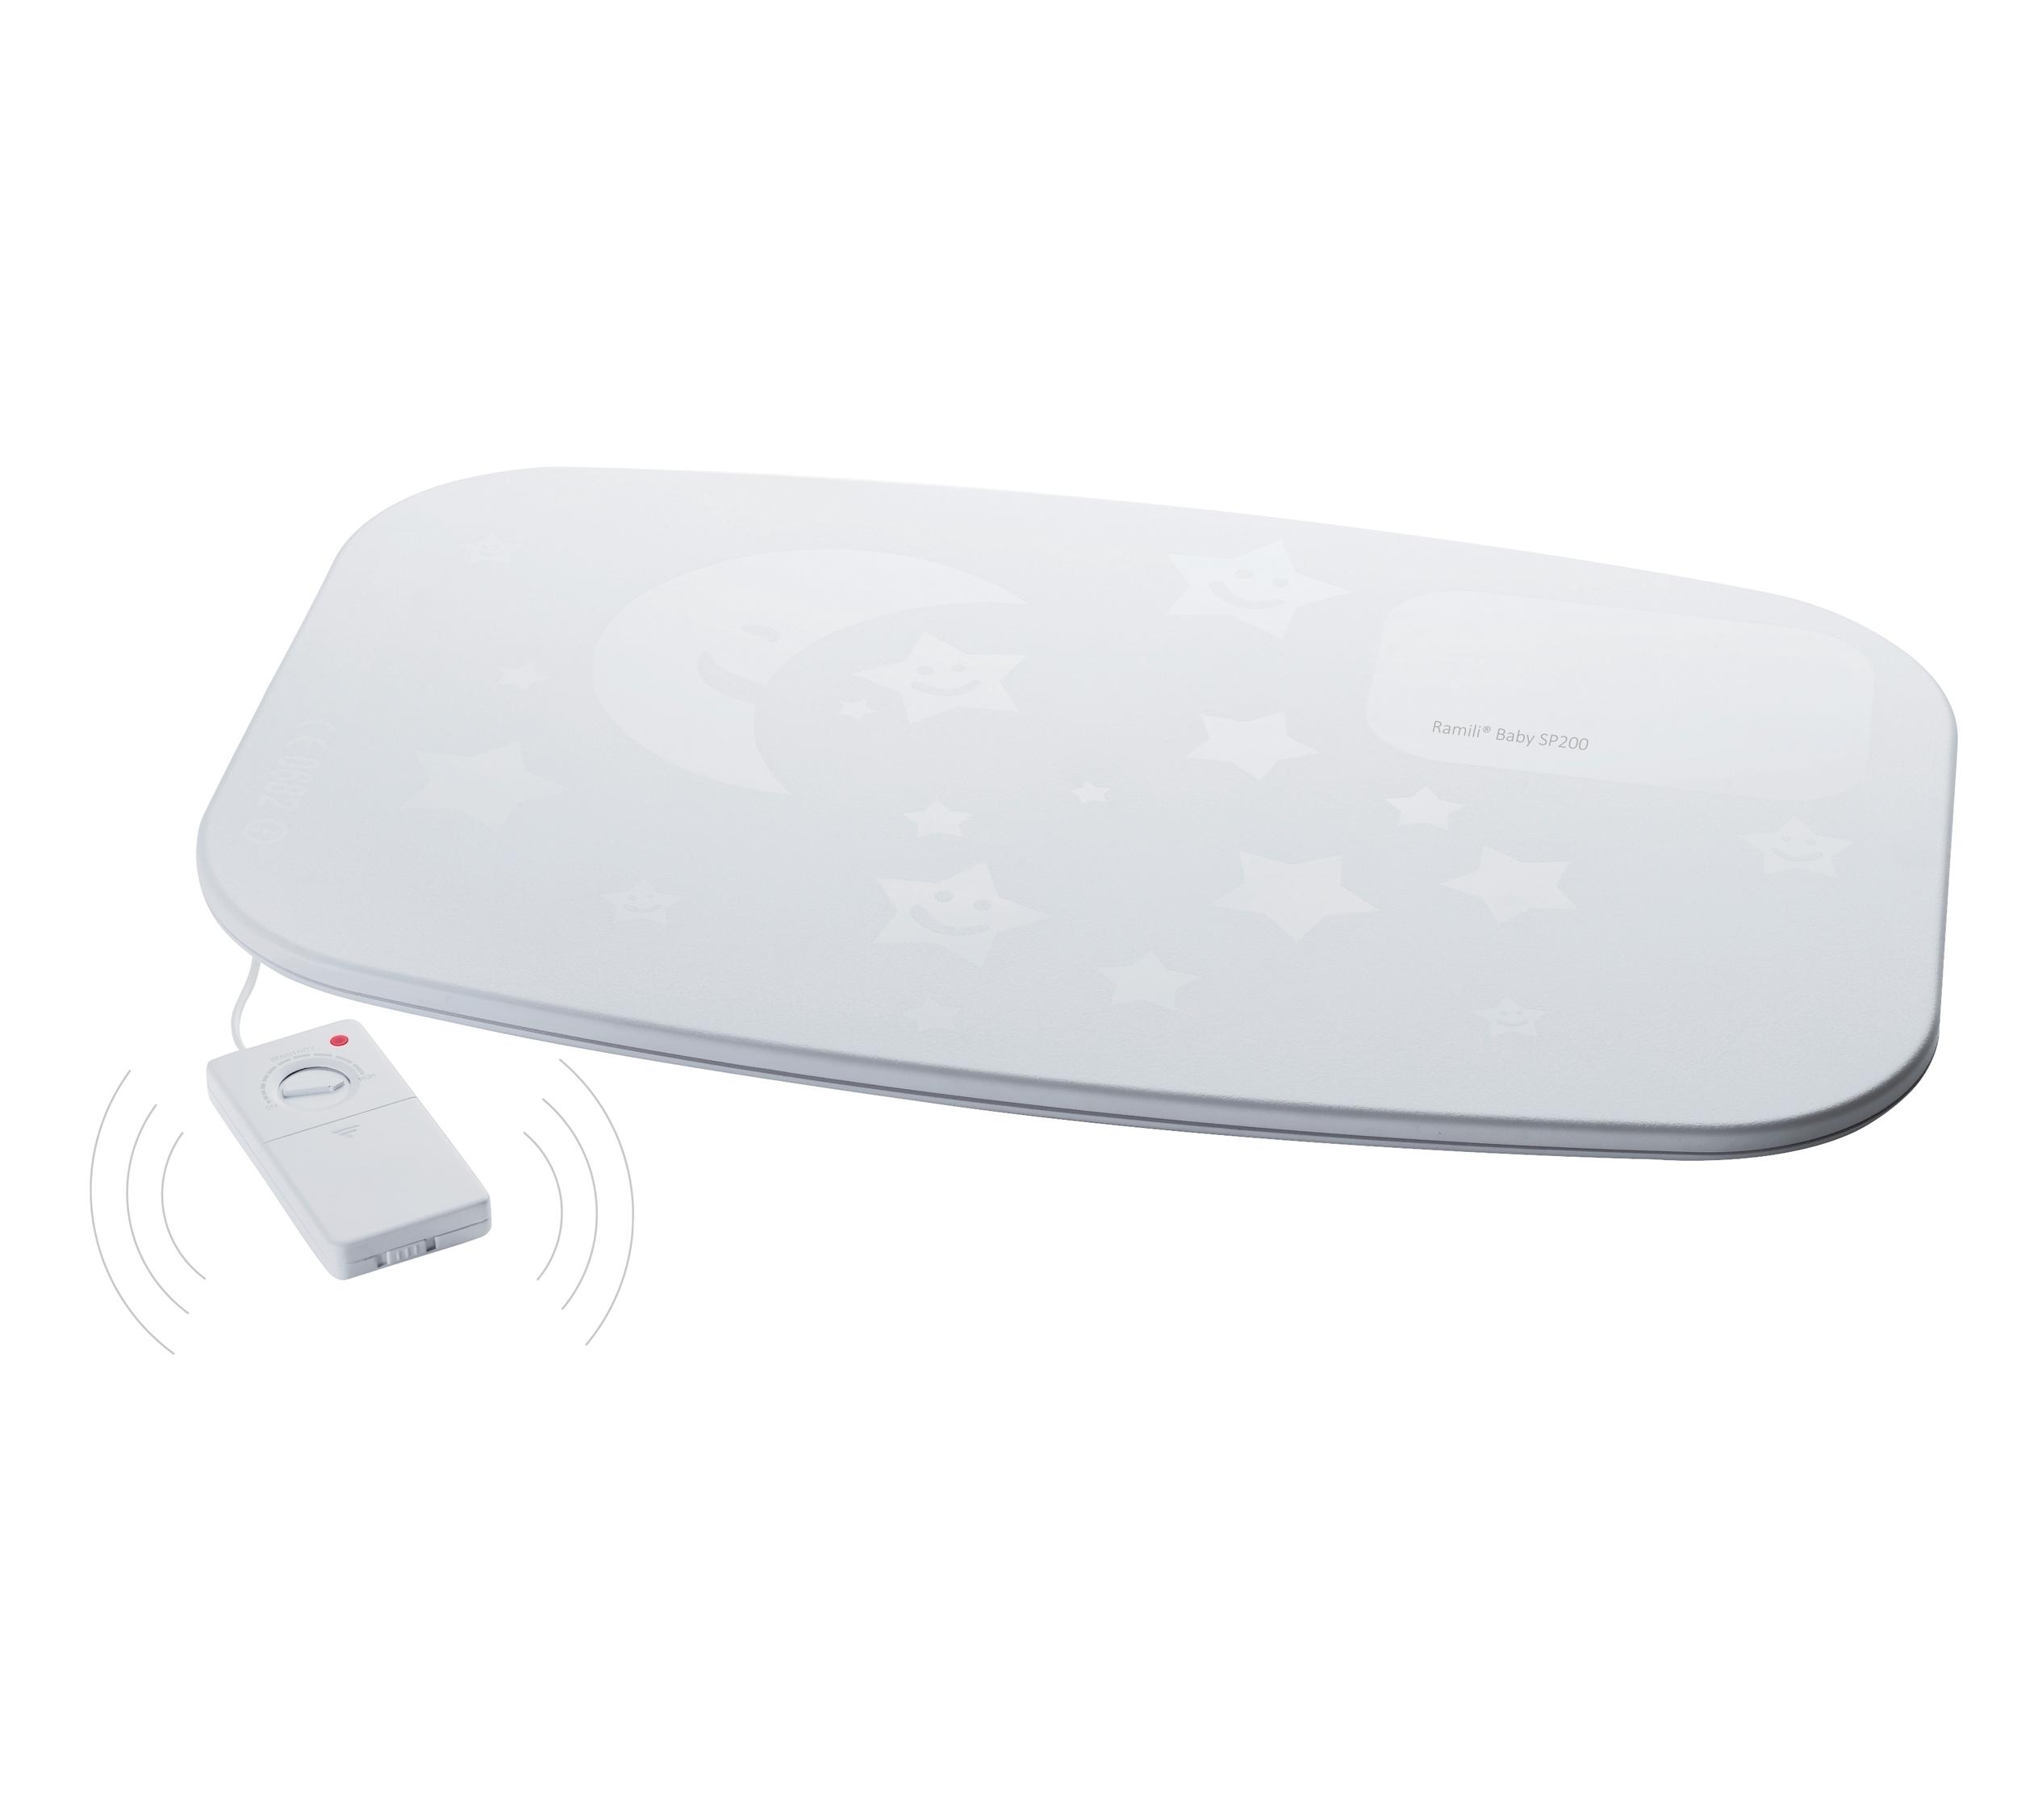 Монитор дыхания Ramili Movement Sensor Pad SP200 -  Безопасность ребенка